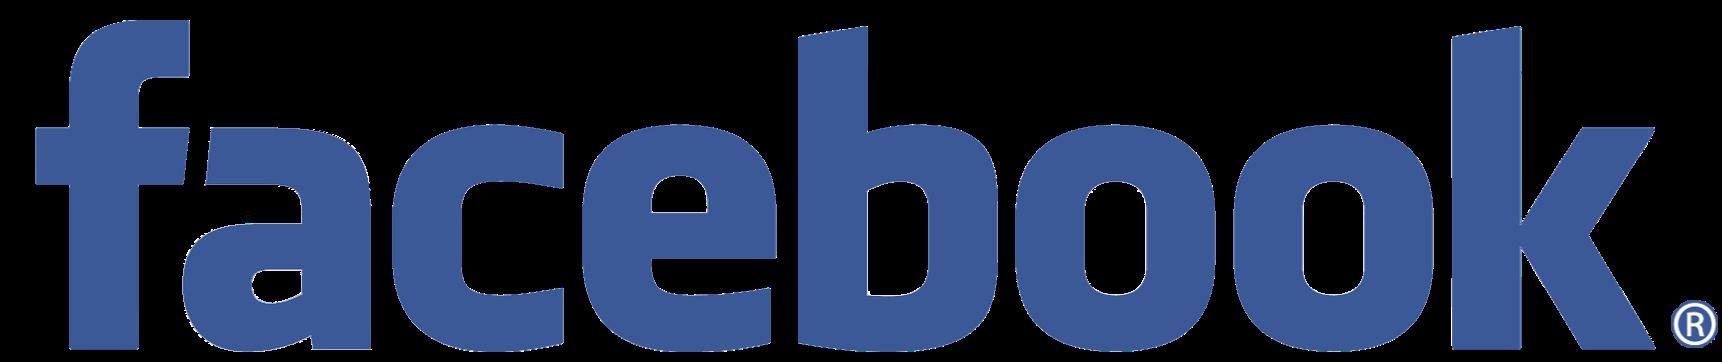 facebook-6